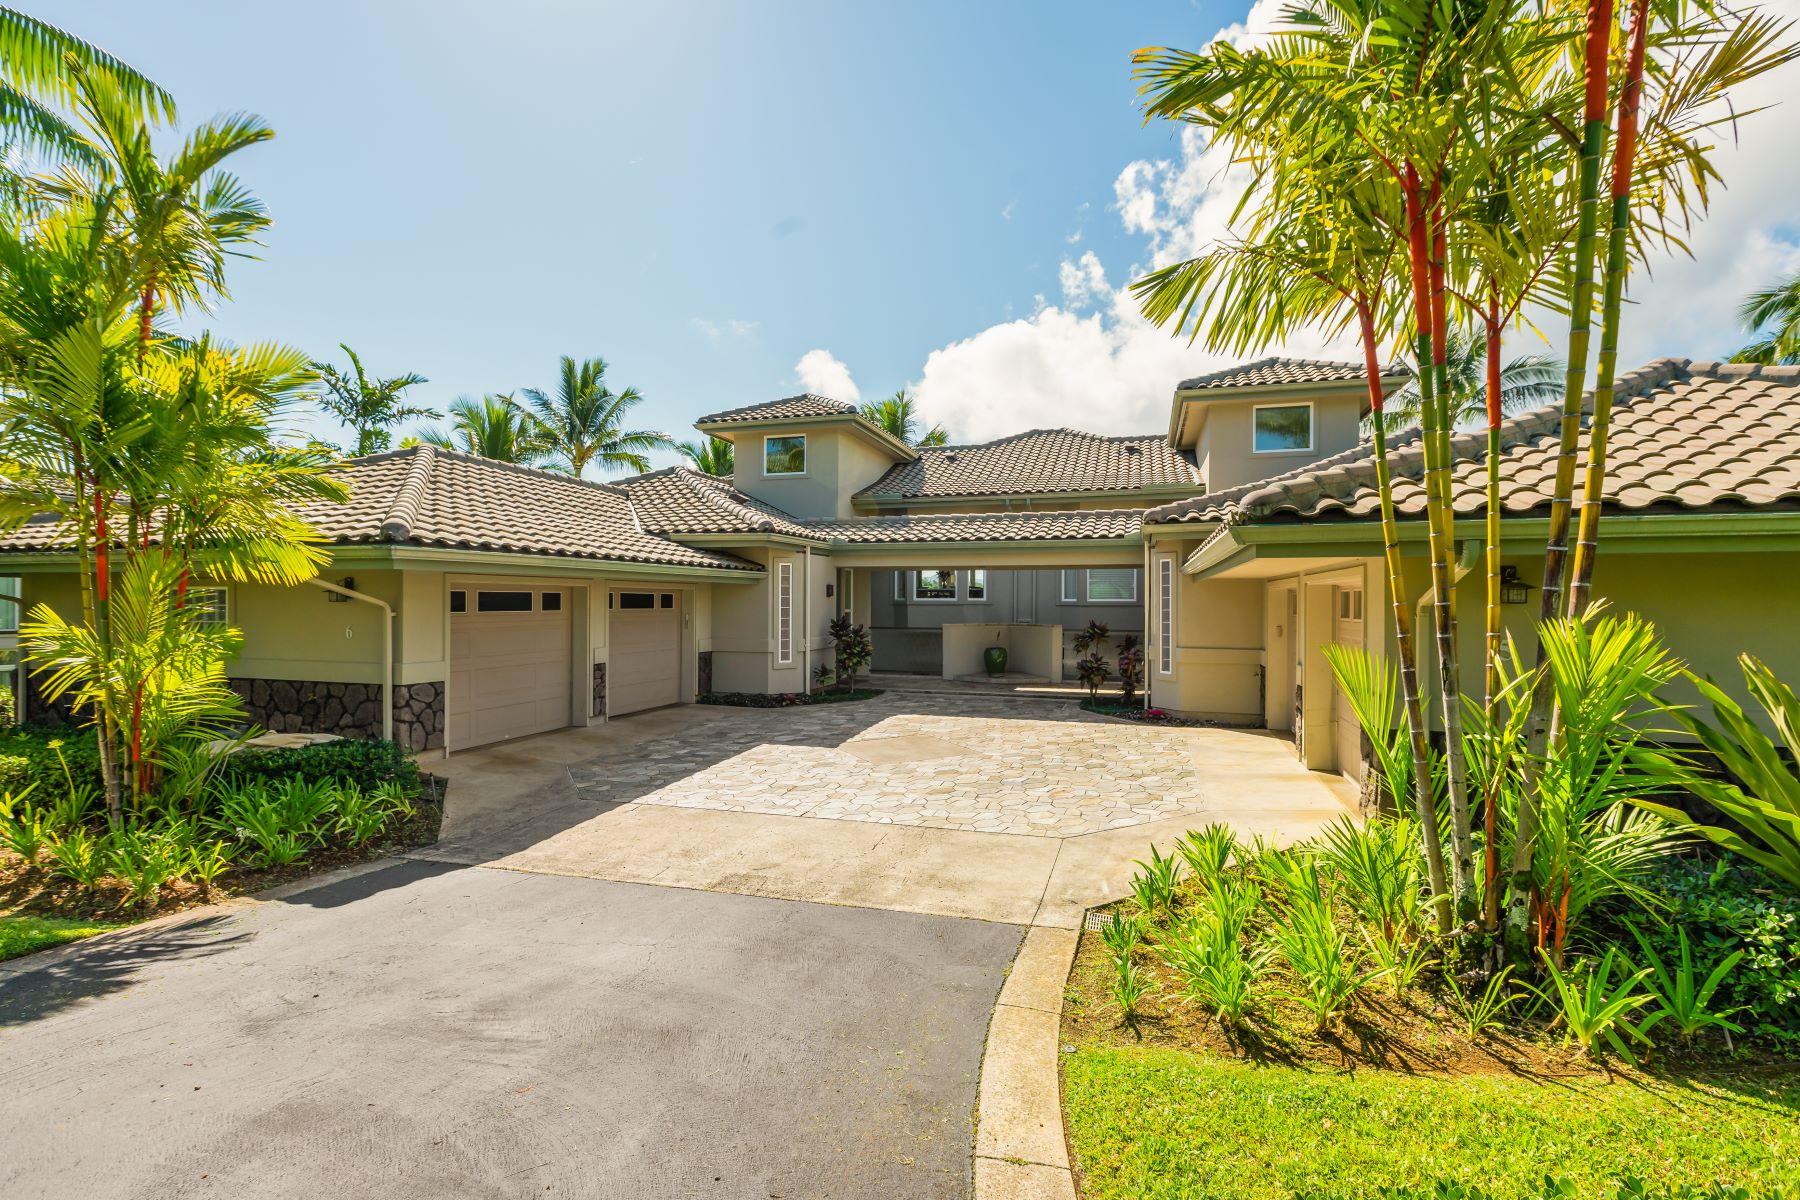 townhouses για την Πώληση στο Kaiulani of Princeville #6 4100 Queen Emmas Drive #6, Princeville, Χαβαη 96722 Ηνωμένες Πολιτείες